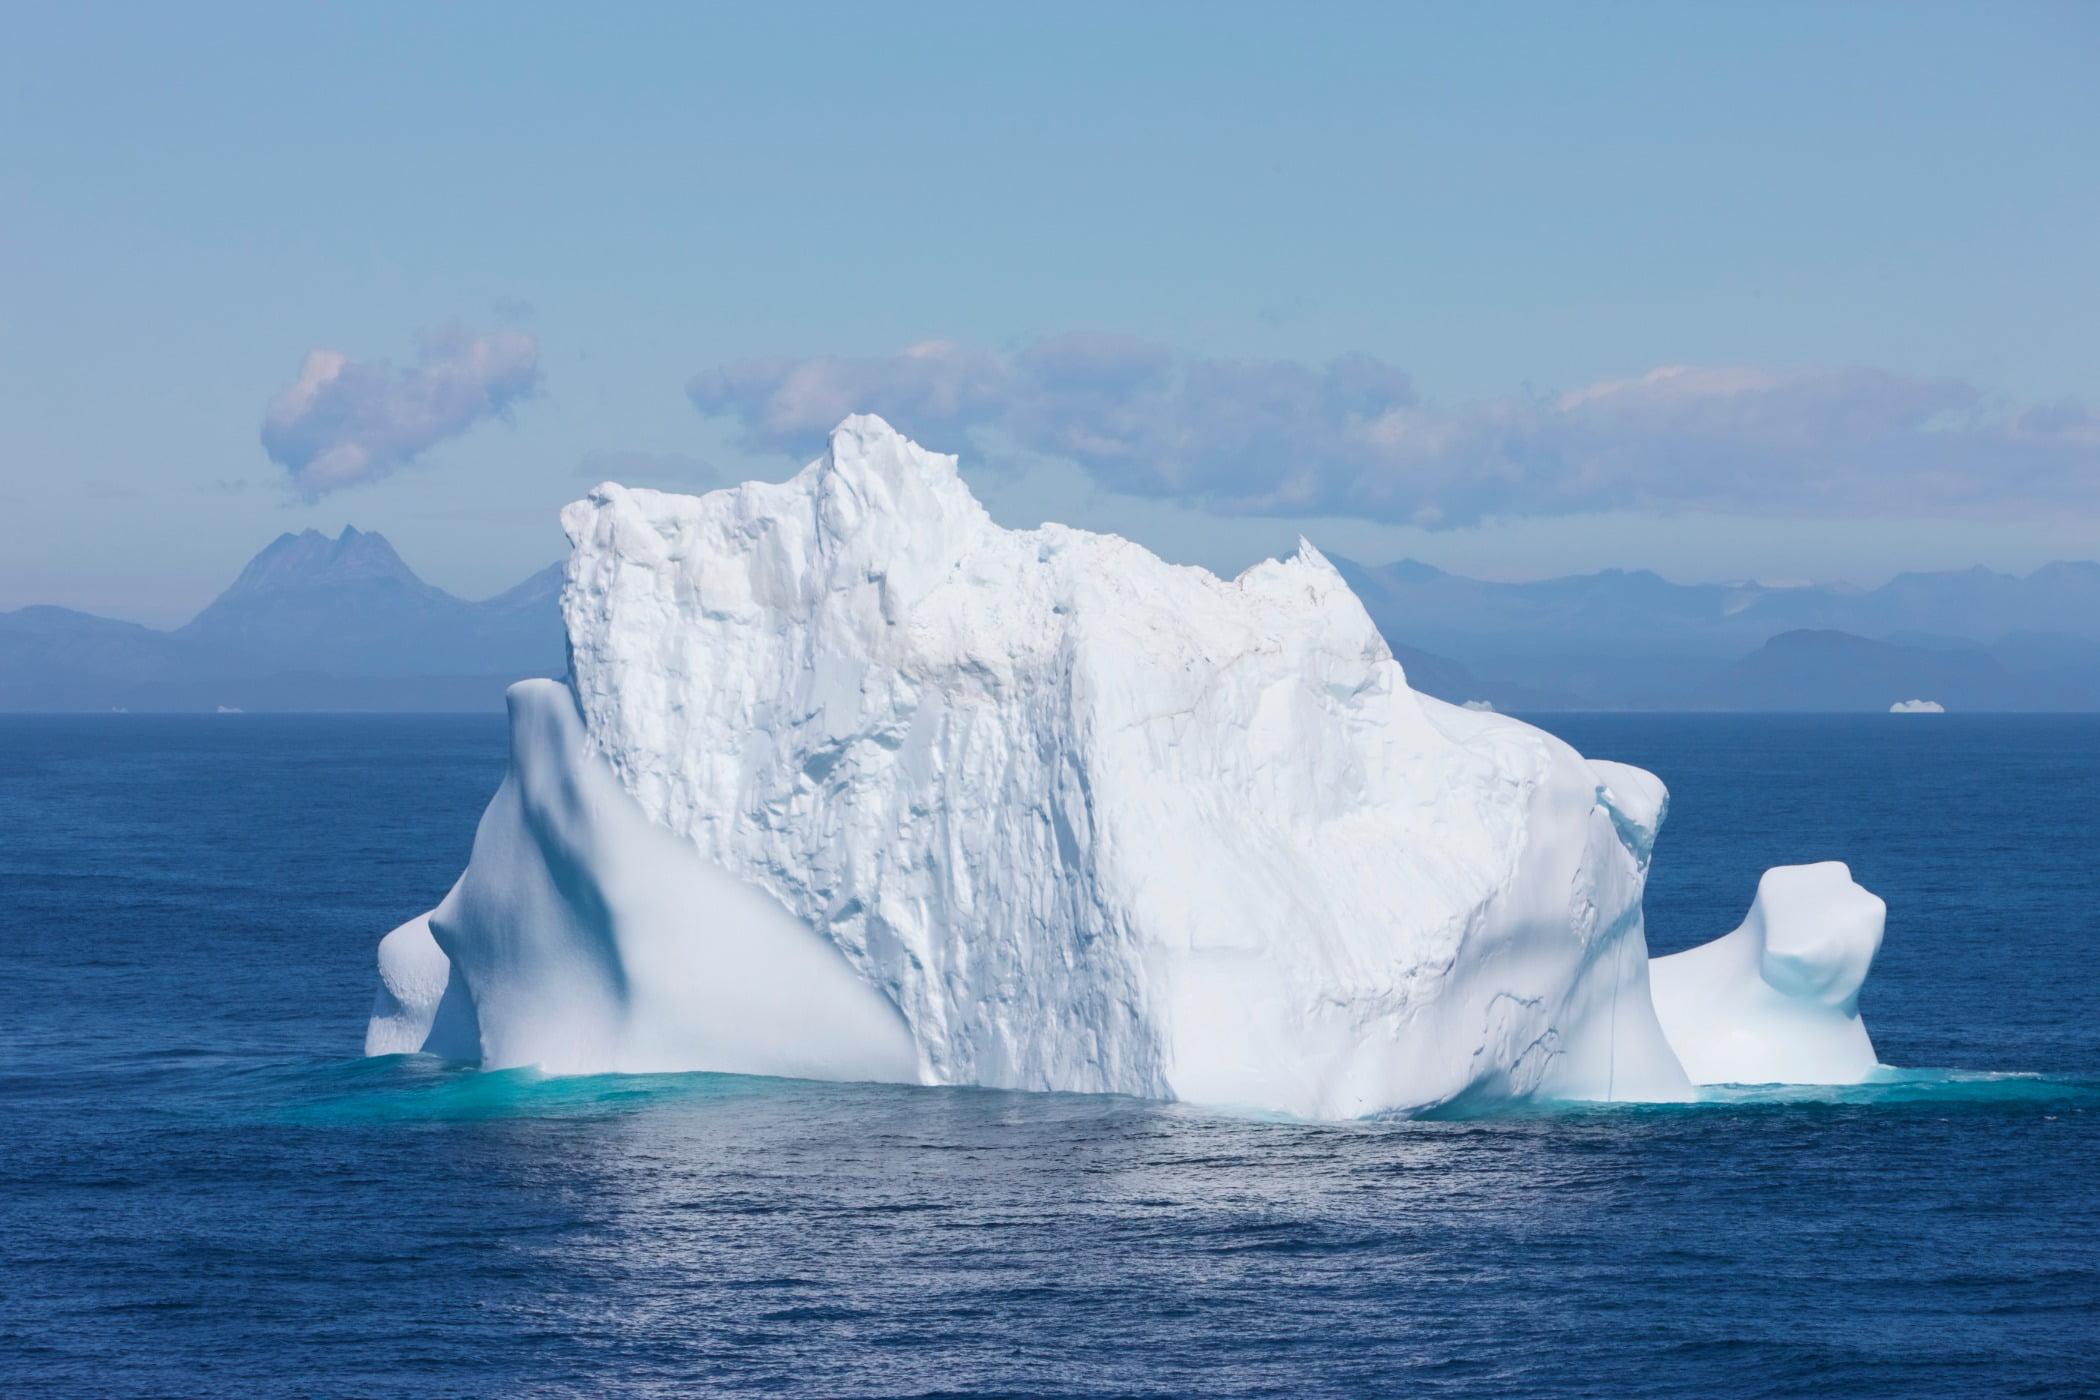 Water resources, Natural landscape, Sea ice, Sky, Liquid, Snow, Fluid, Cloud